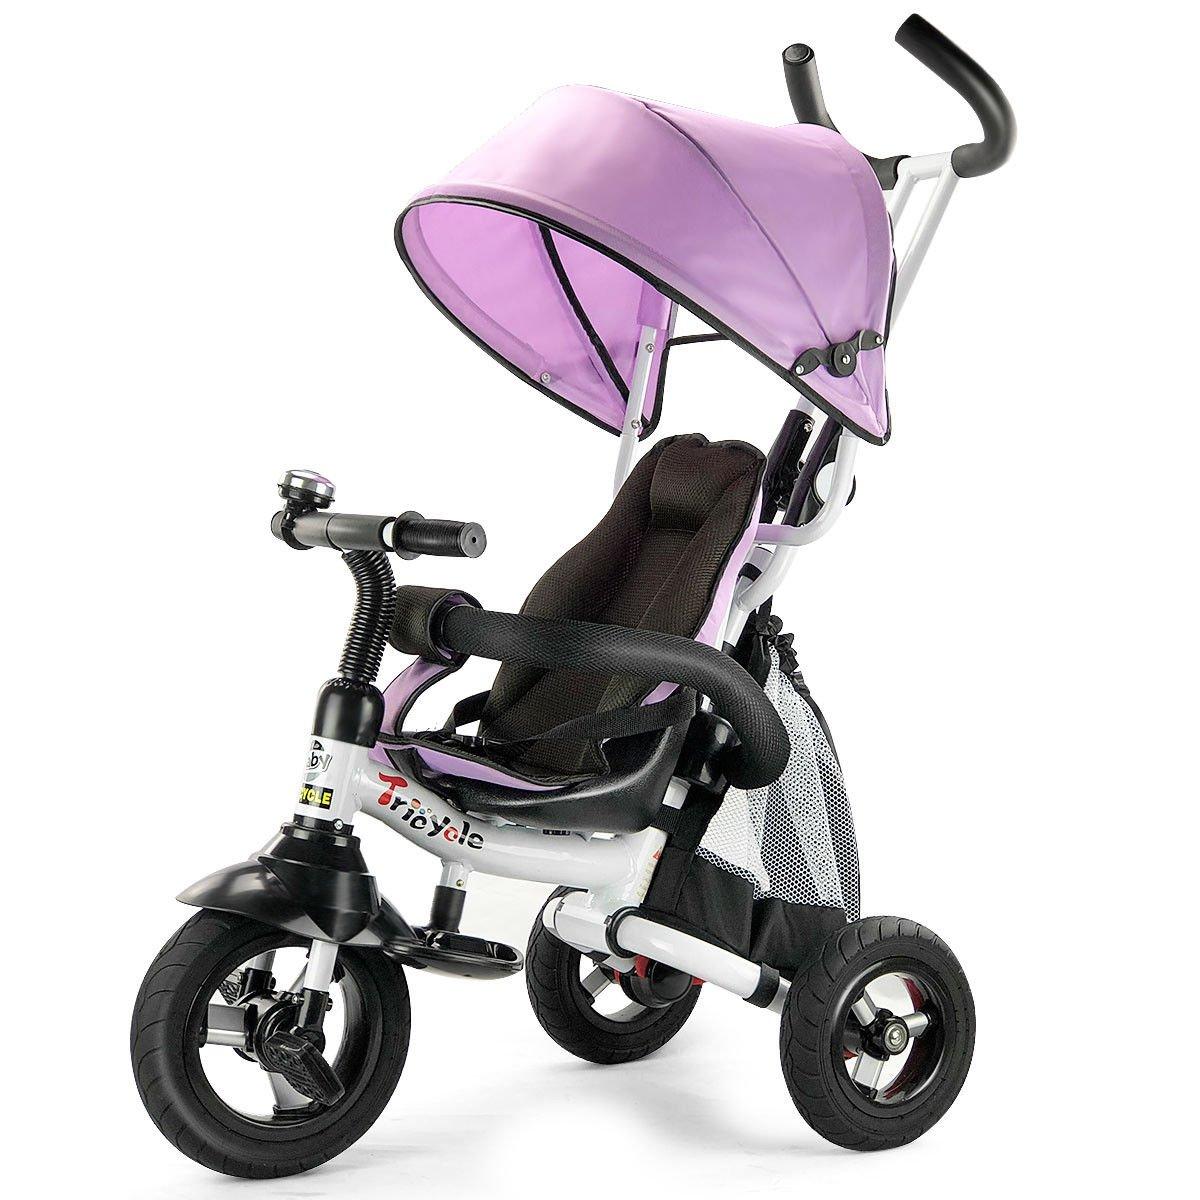 Costzon 6-In-1 Baby Tricycle, Detachable Learning Bike w/Canopy Bag, Steer Stroller Costzon 4-In-1 Baby Tricycle Steer Stroller (Pink)